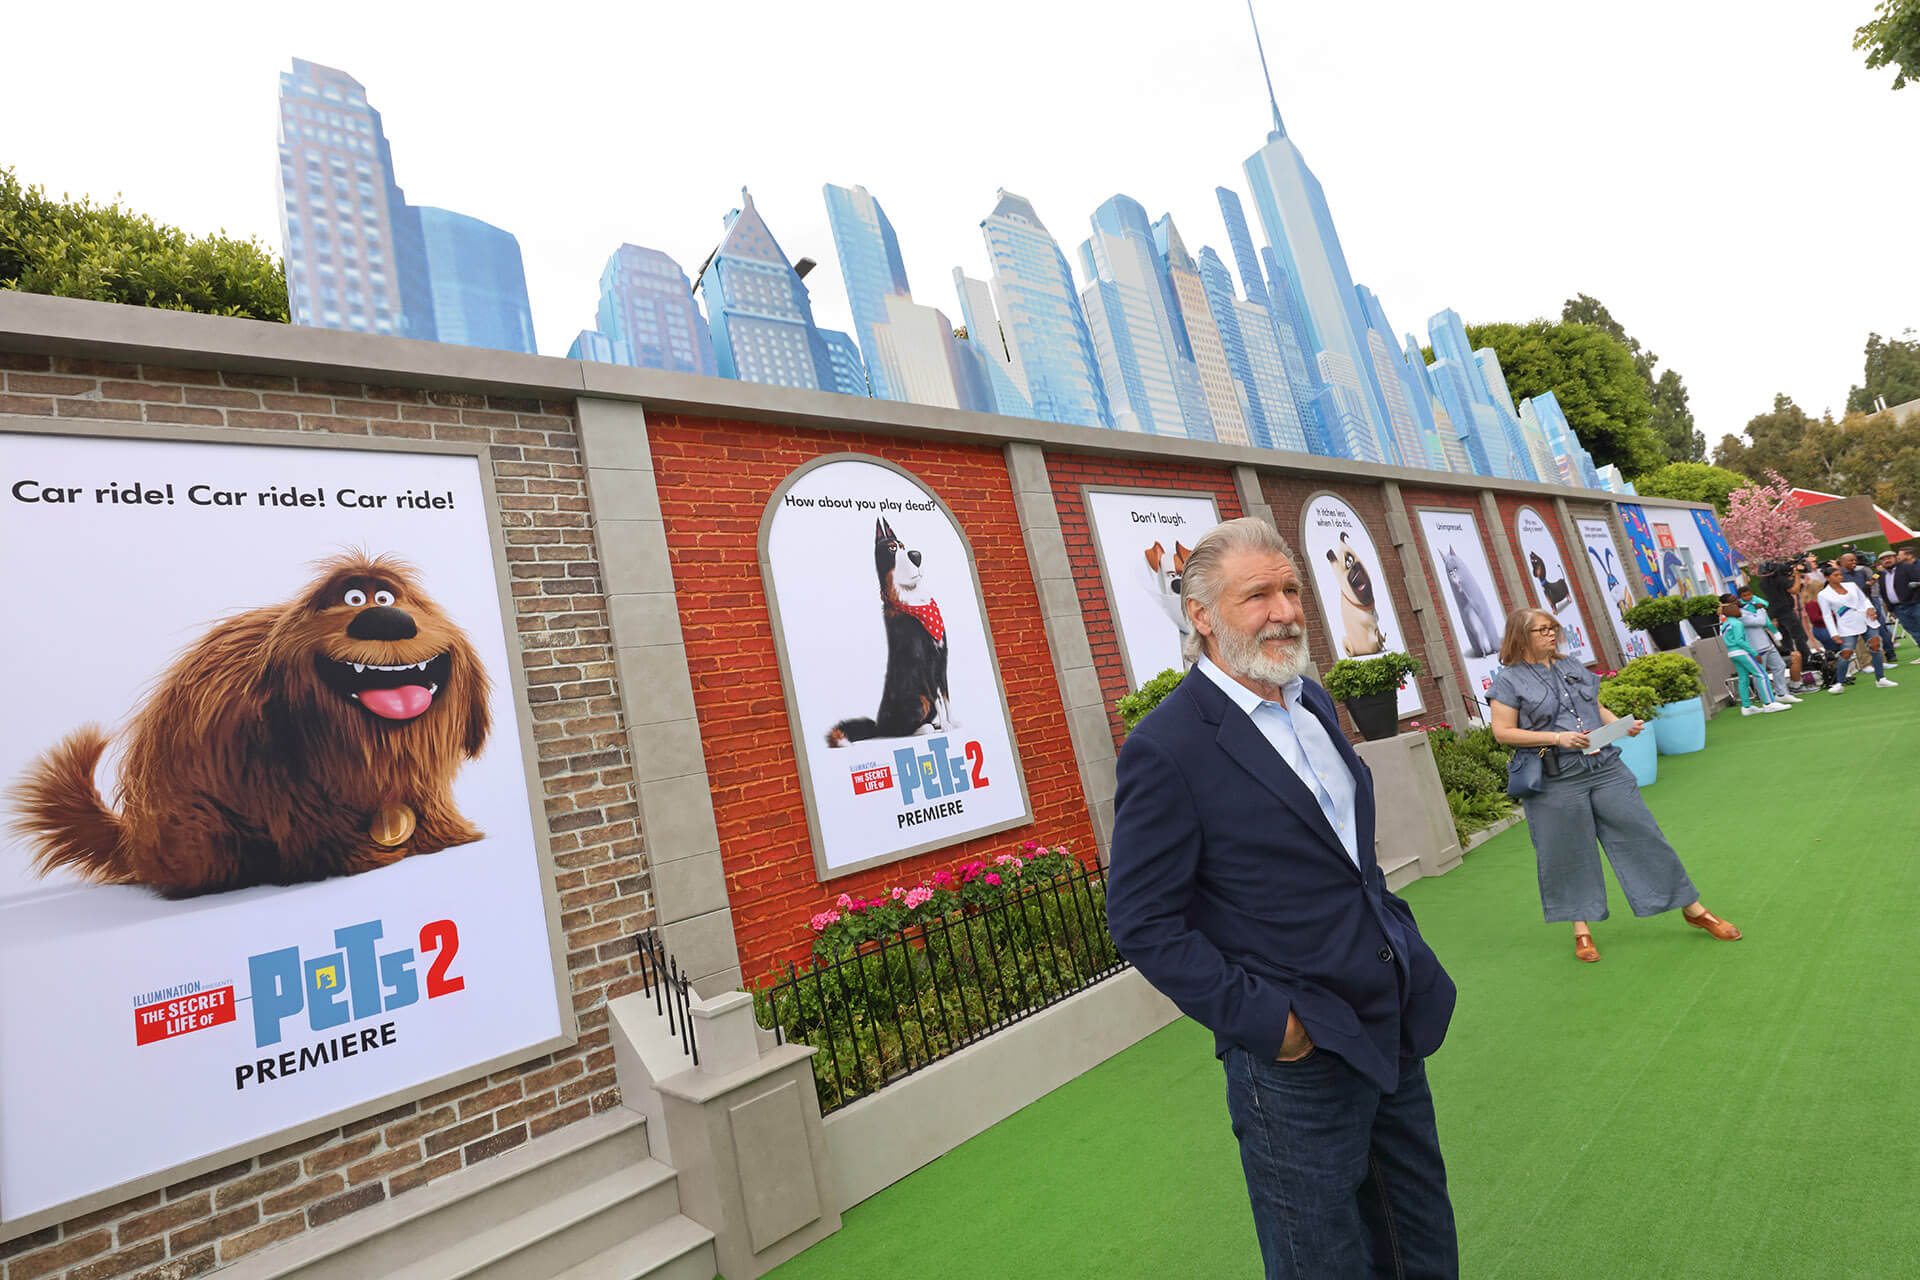 The Secret Life Of Pets 2 Movie Premiere Los Angeles JG2 Collective